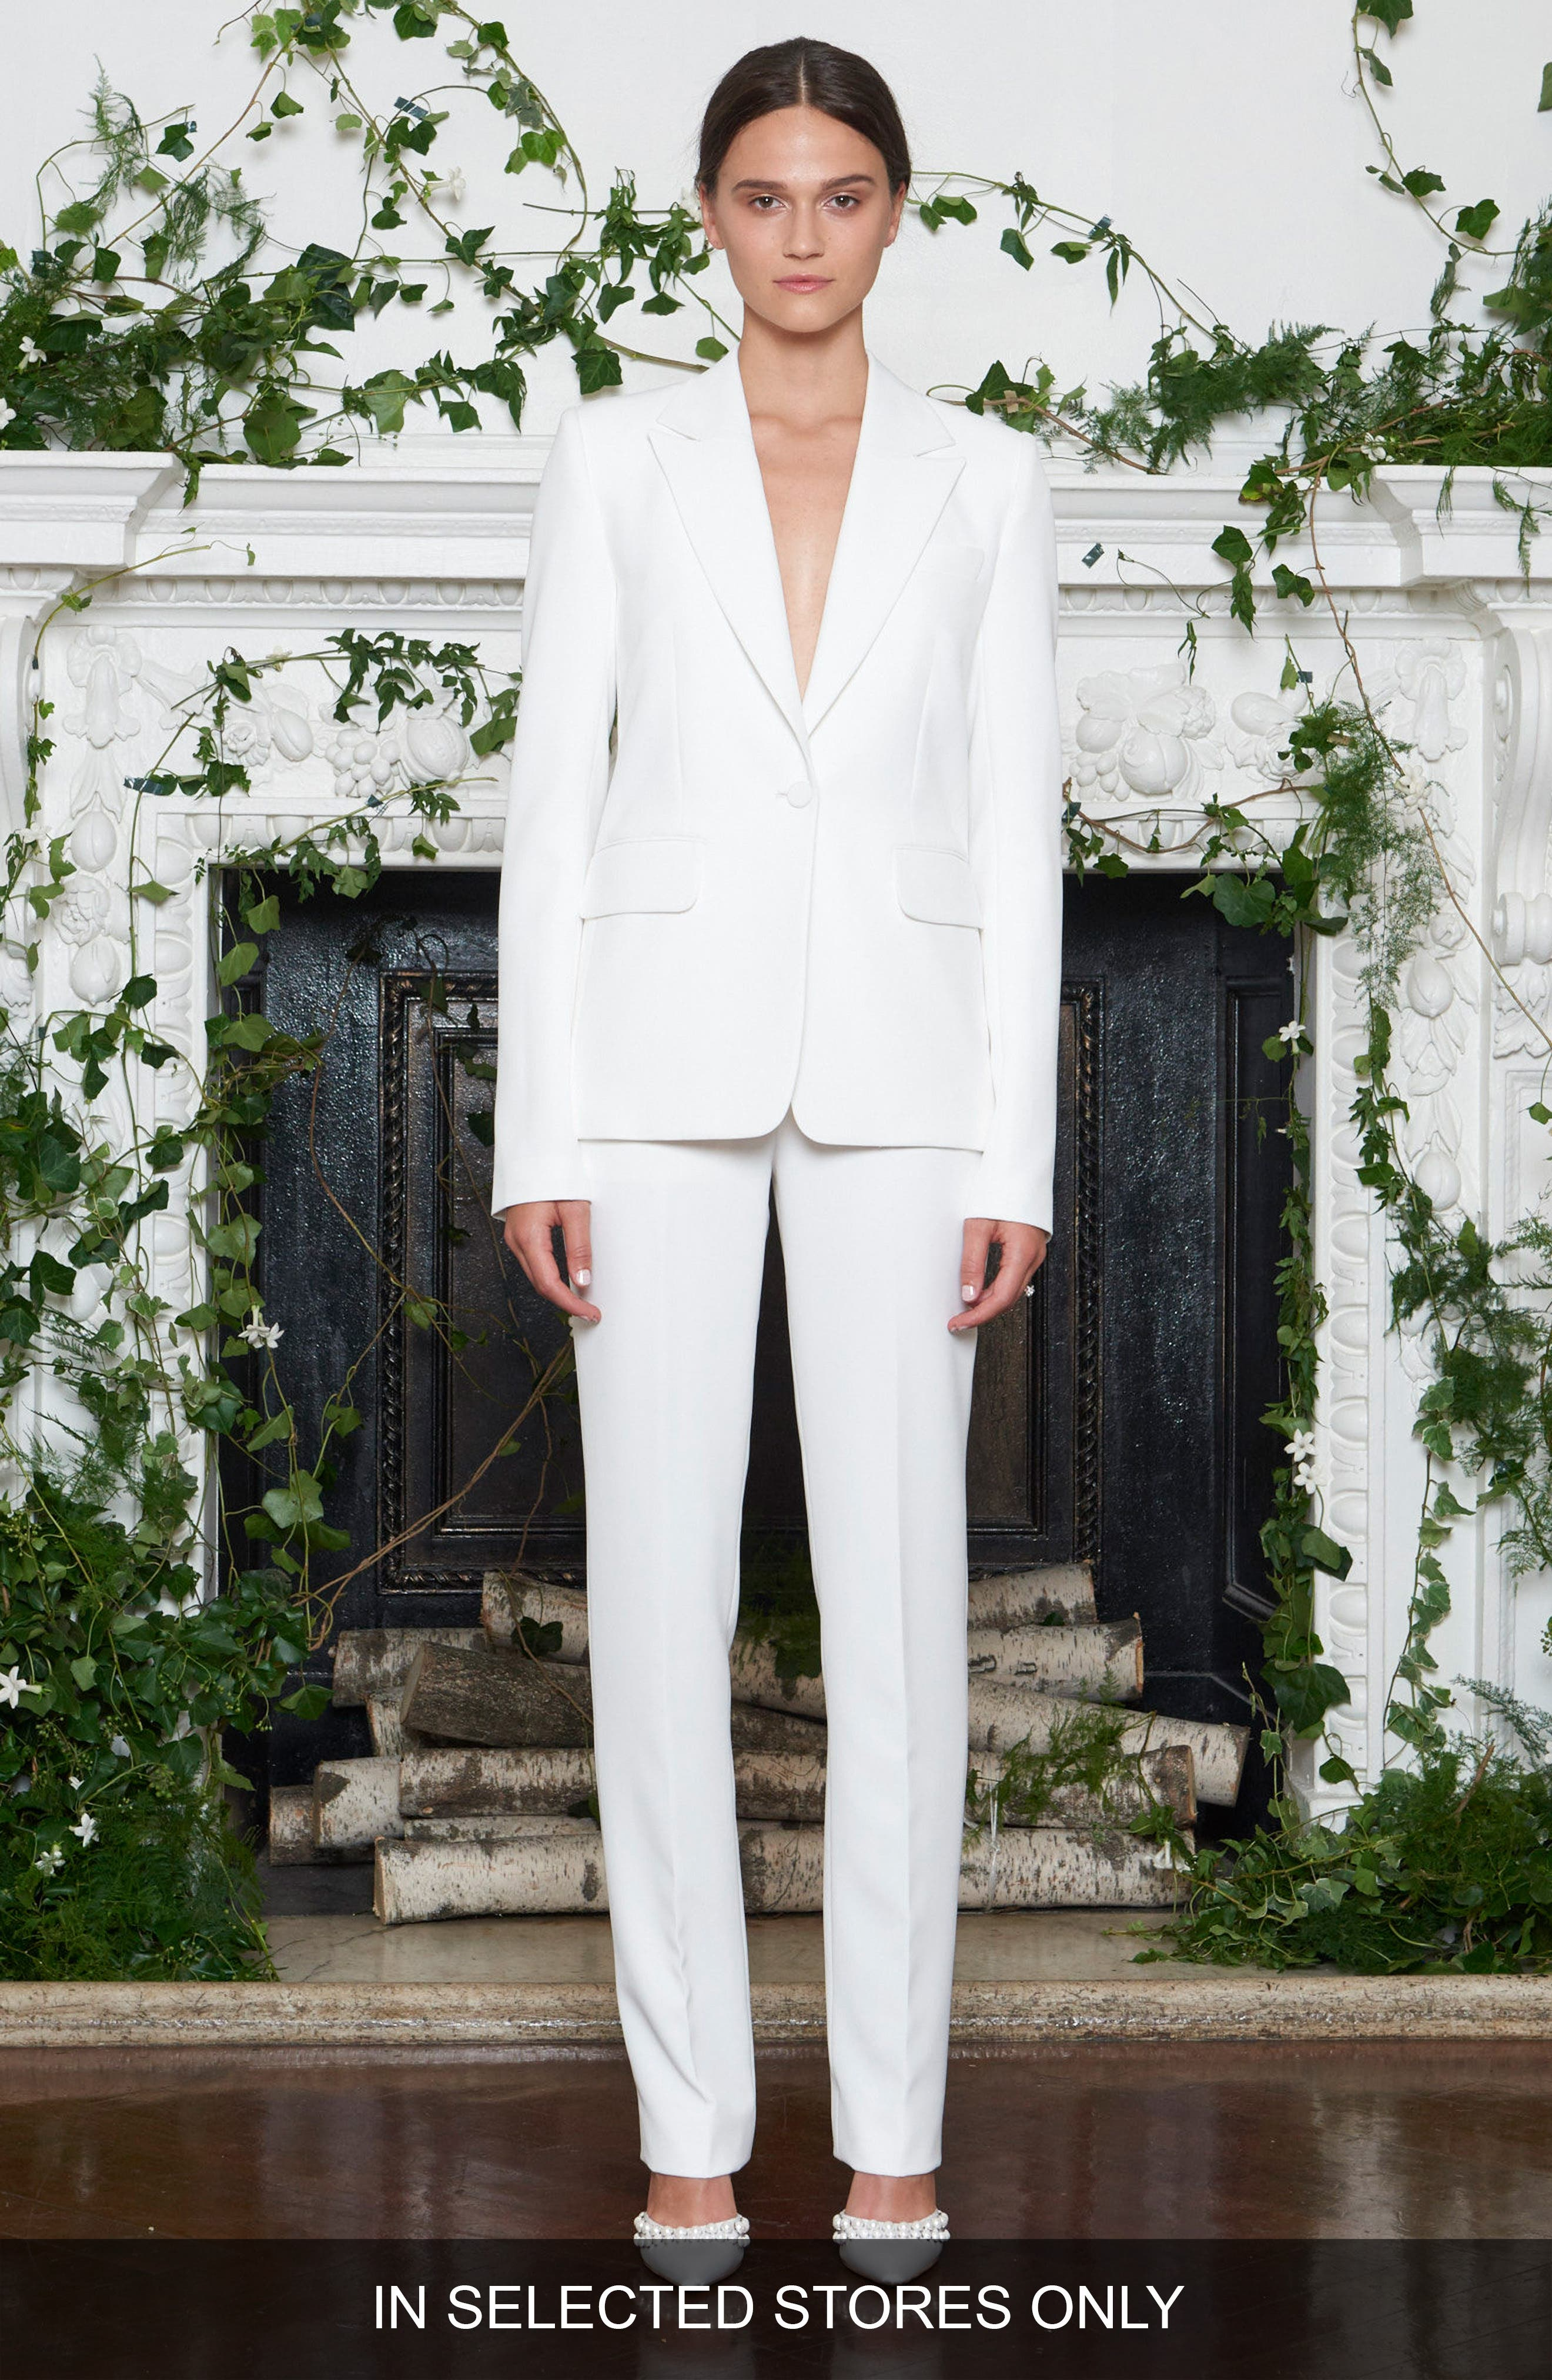 Monique Lhuillier Yoko Double Weave Tuxedo Jacket